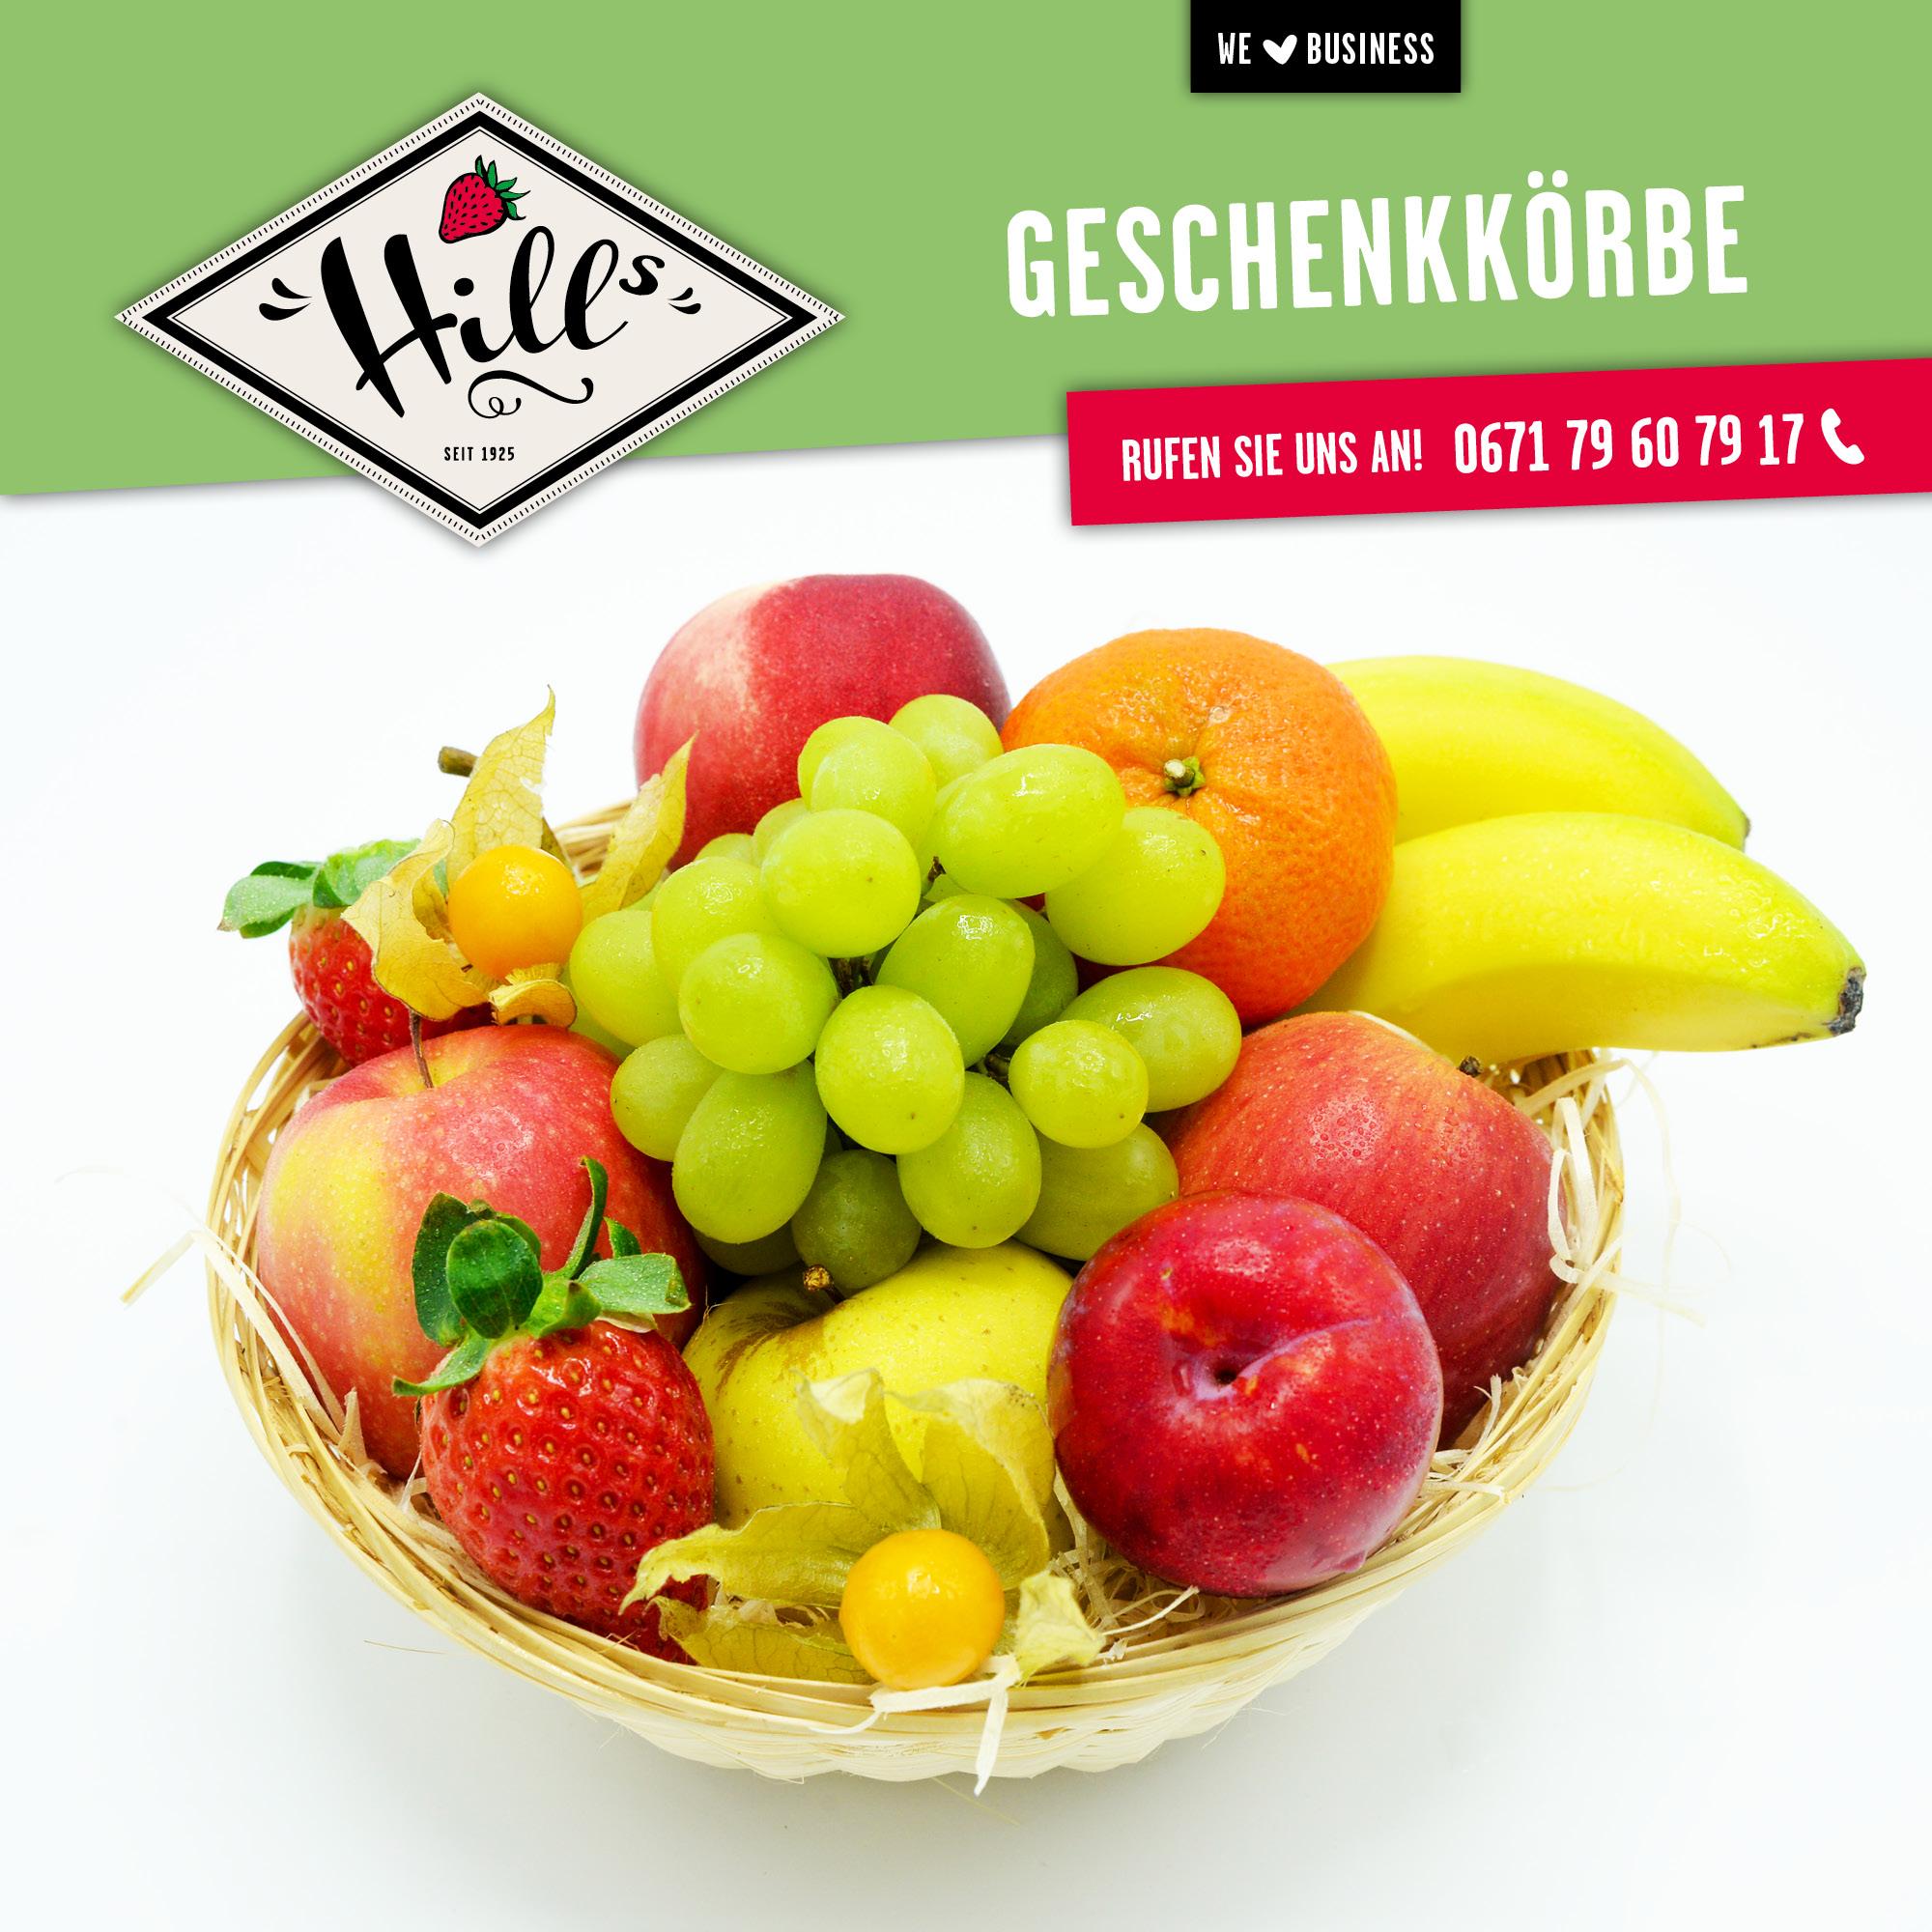 20180417_Hills_Service_Geschenkkörbe_FB3.jpg